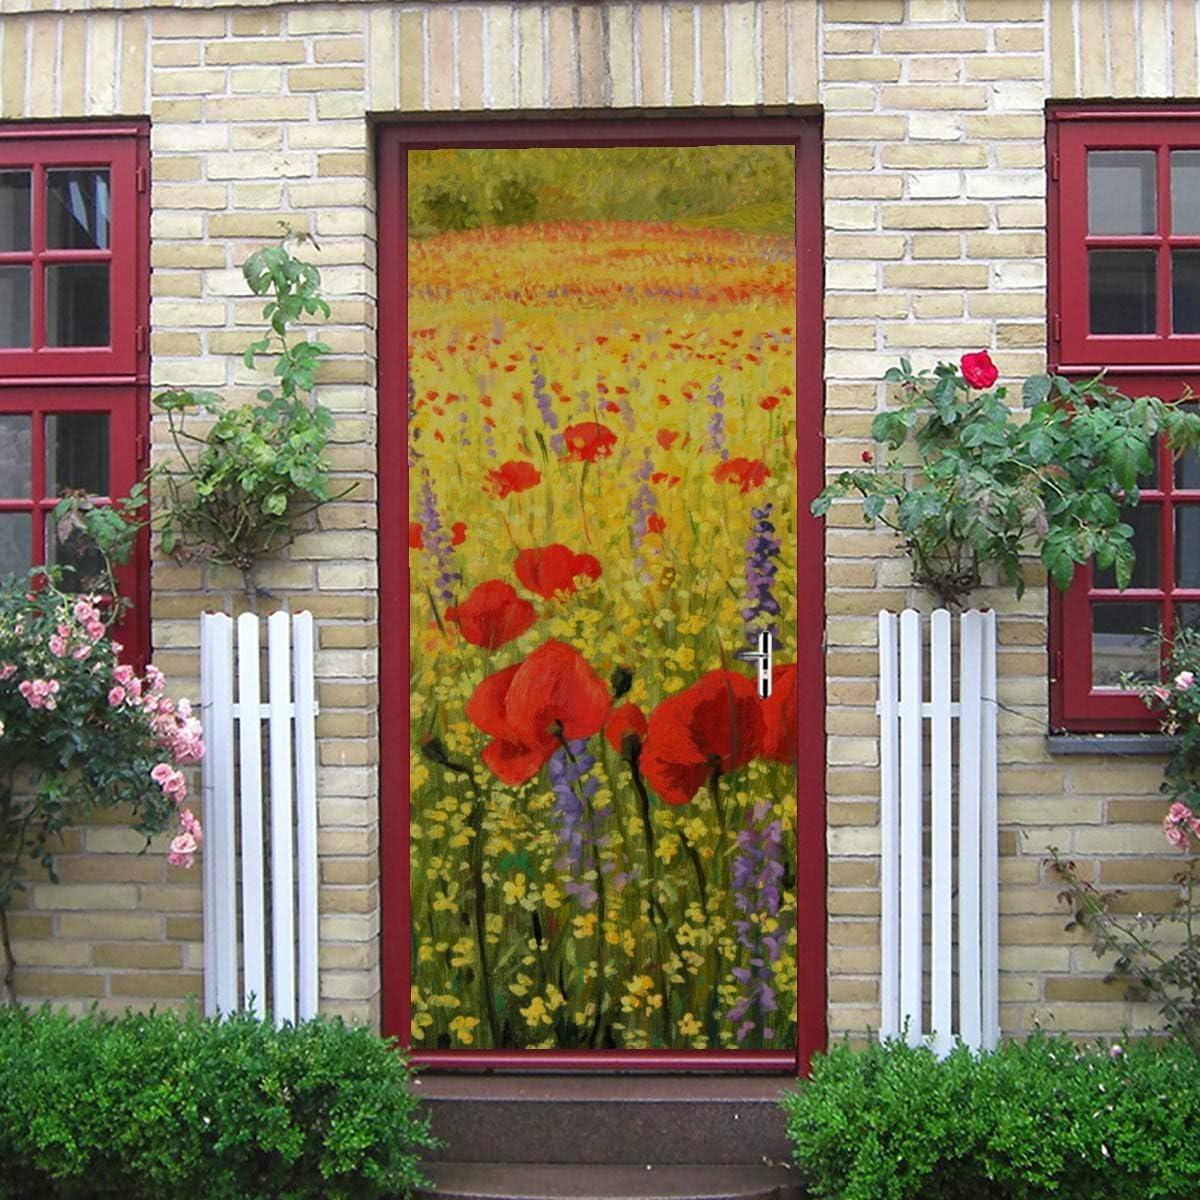 77x200cm 2 Pieces Art Yellow Mountain Poppy Oil Painting Self-Adhesive Vinyl Removable Door Stickers for Bedroom Door Sticker 30x79 Inch